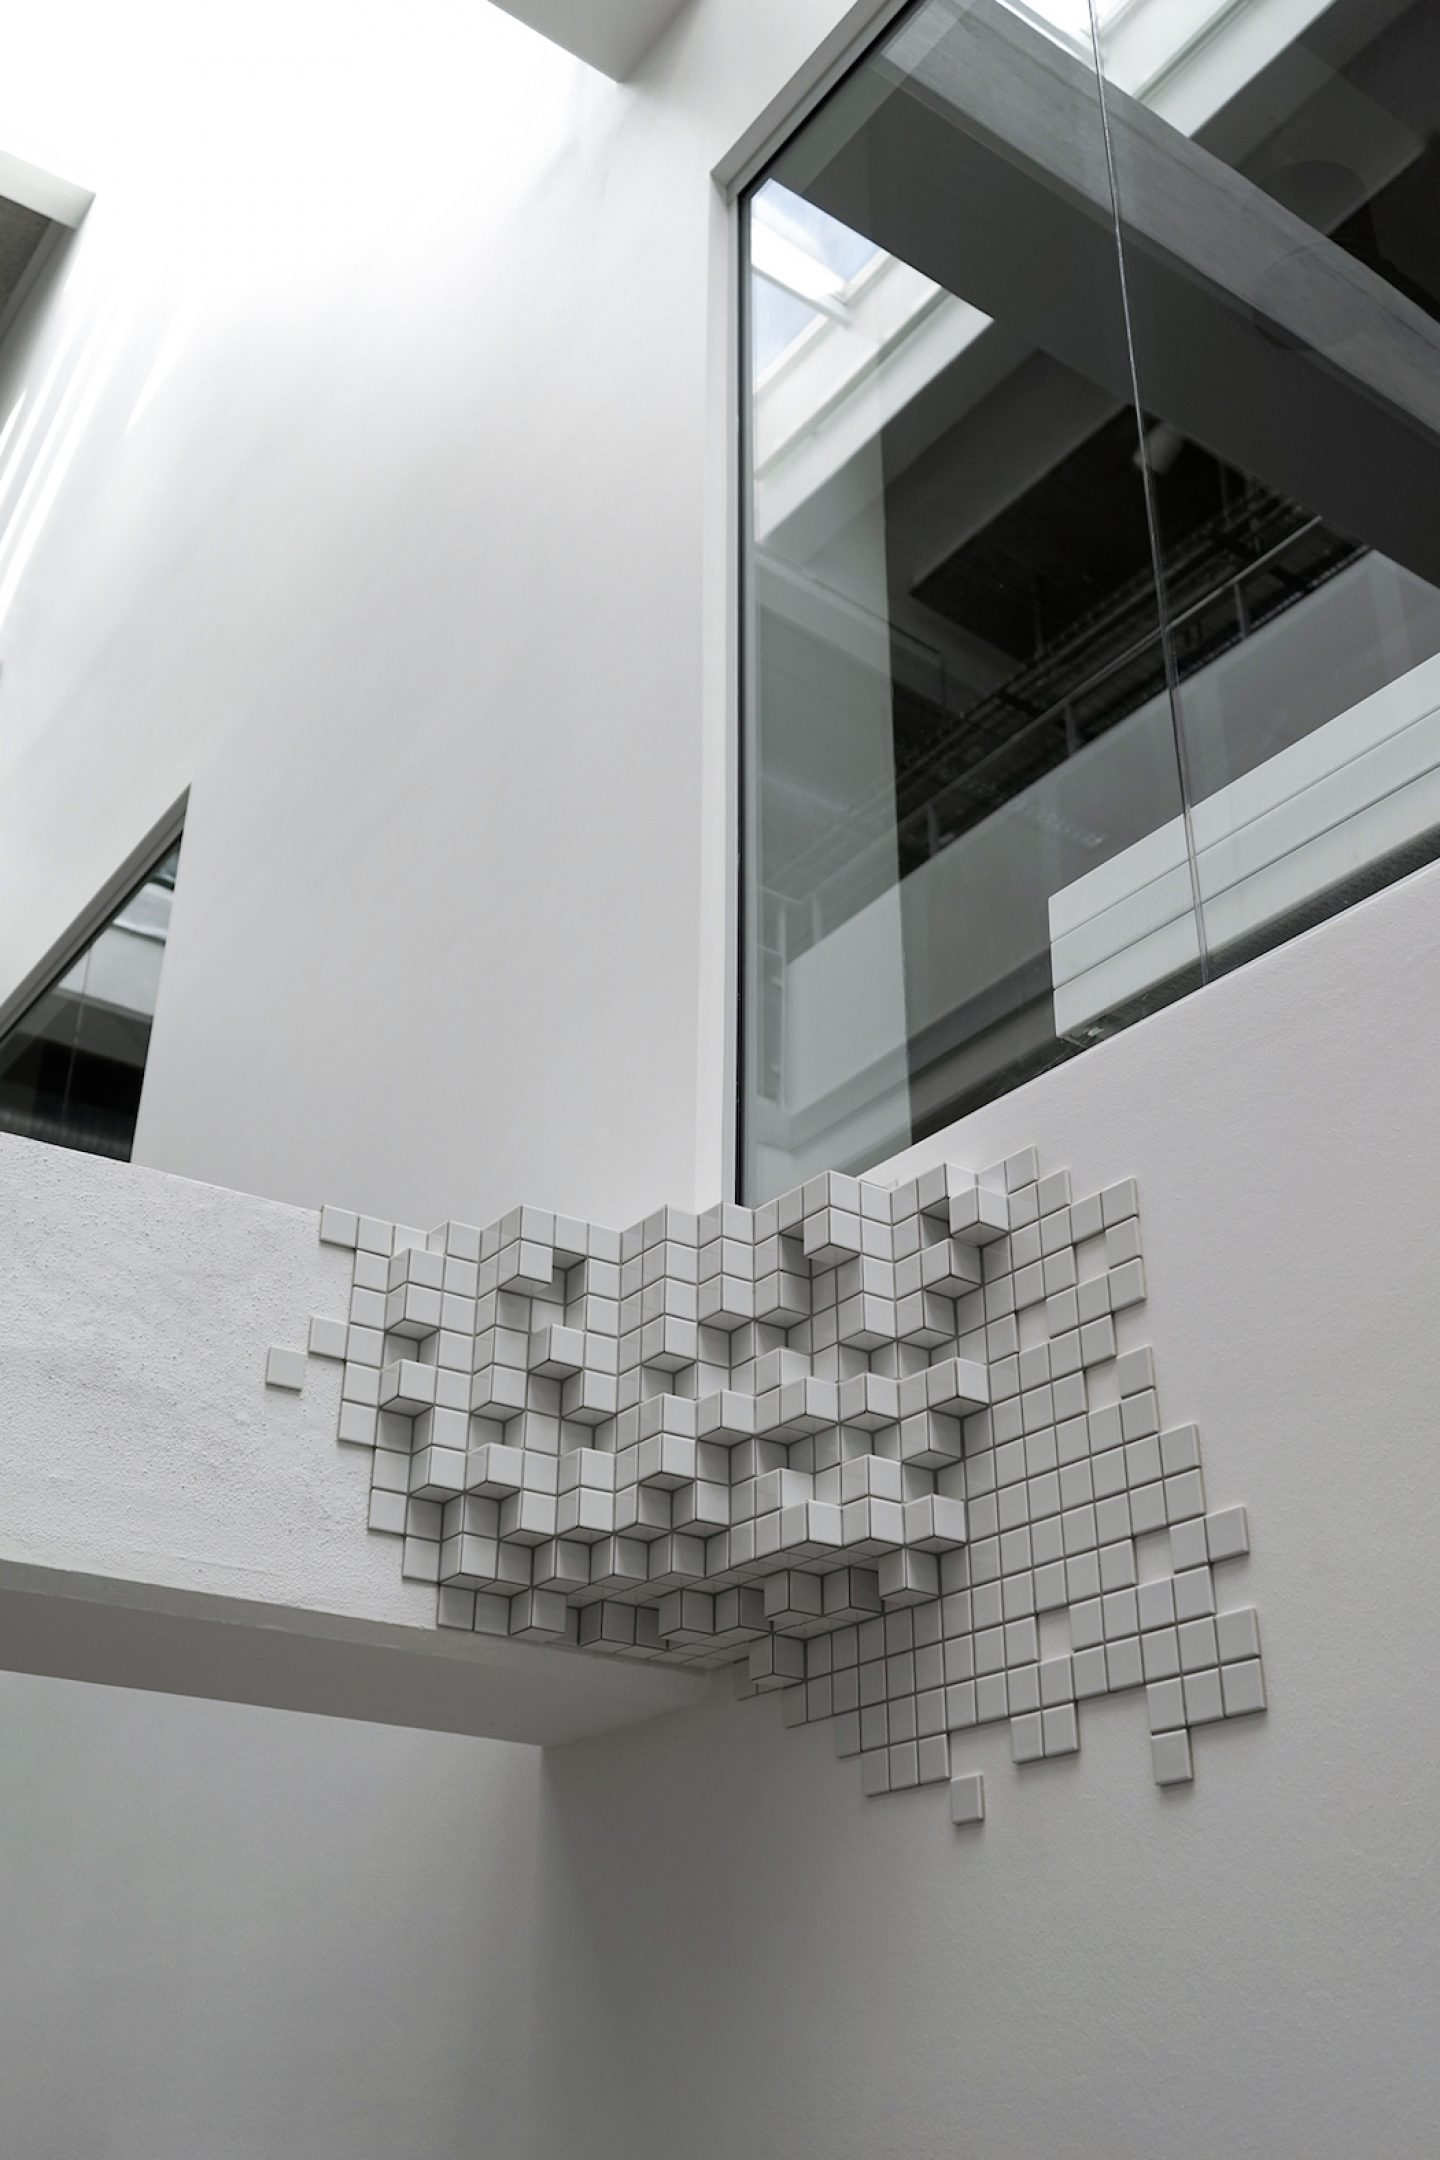 art_borgmannlenk_mos_installation_12